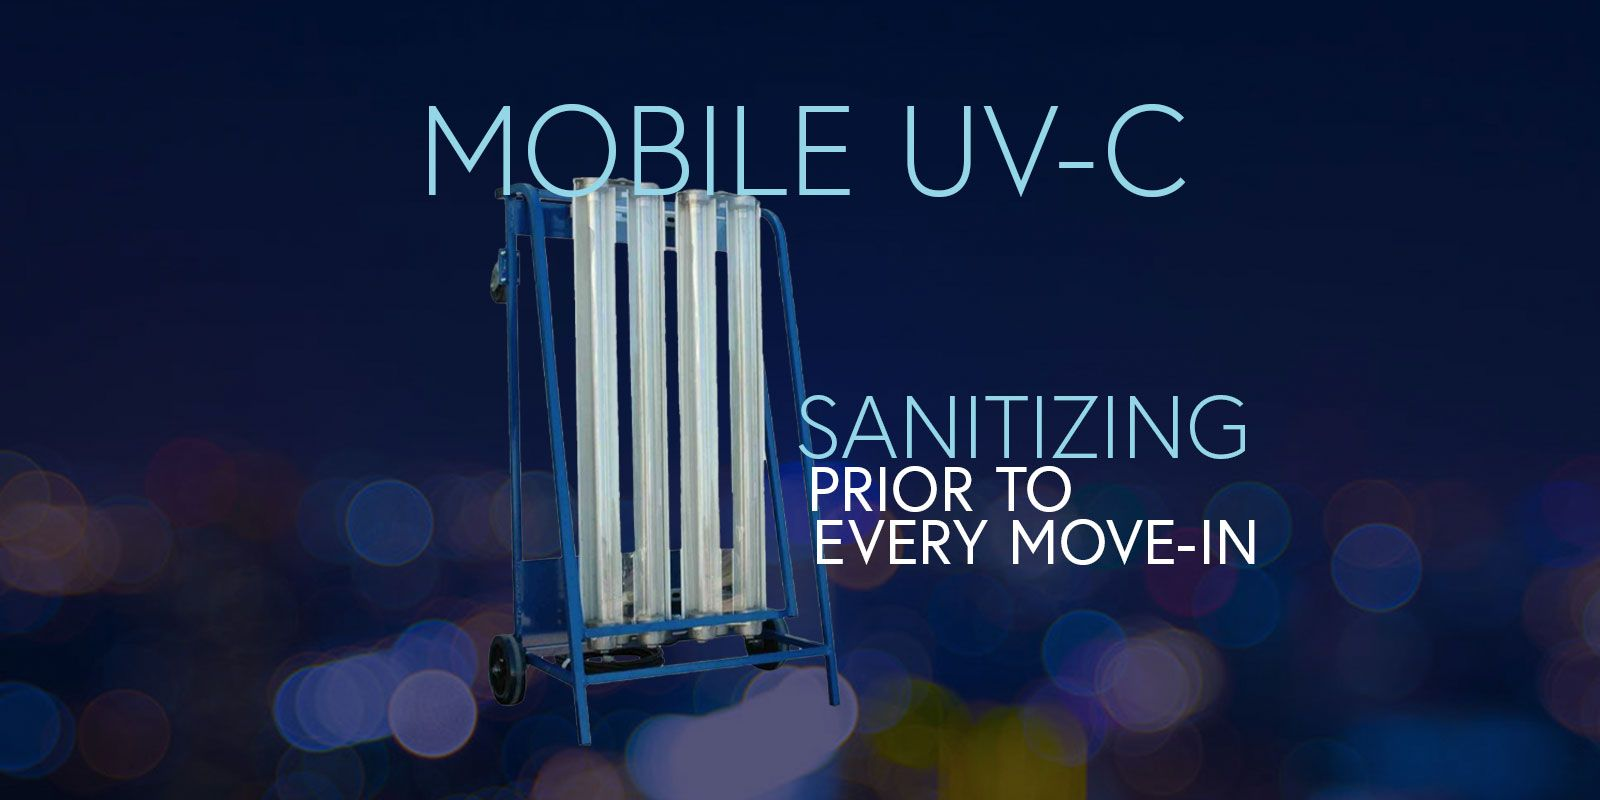 Mobile UV-C Sanatizing prior to every move-in